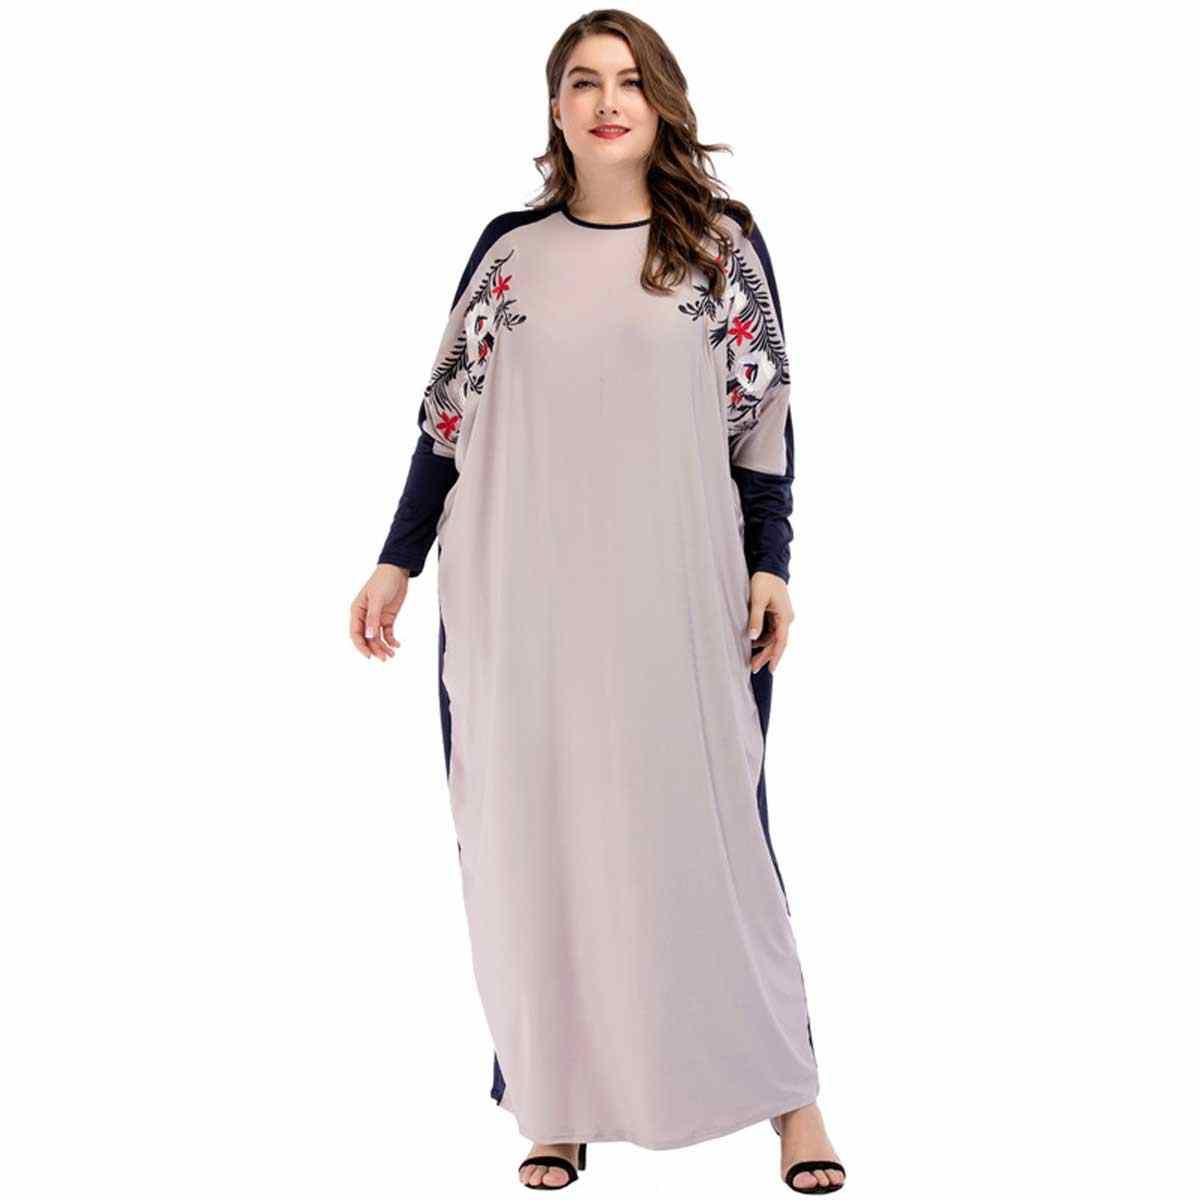 fc4fdee022 2019 Spring Autumn Muslim dress for women Plus Size Vestidos Bat sleeve  embroidery long dress female